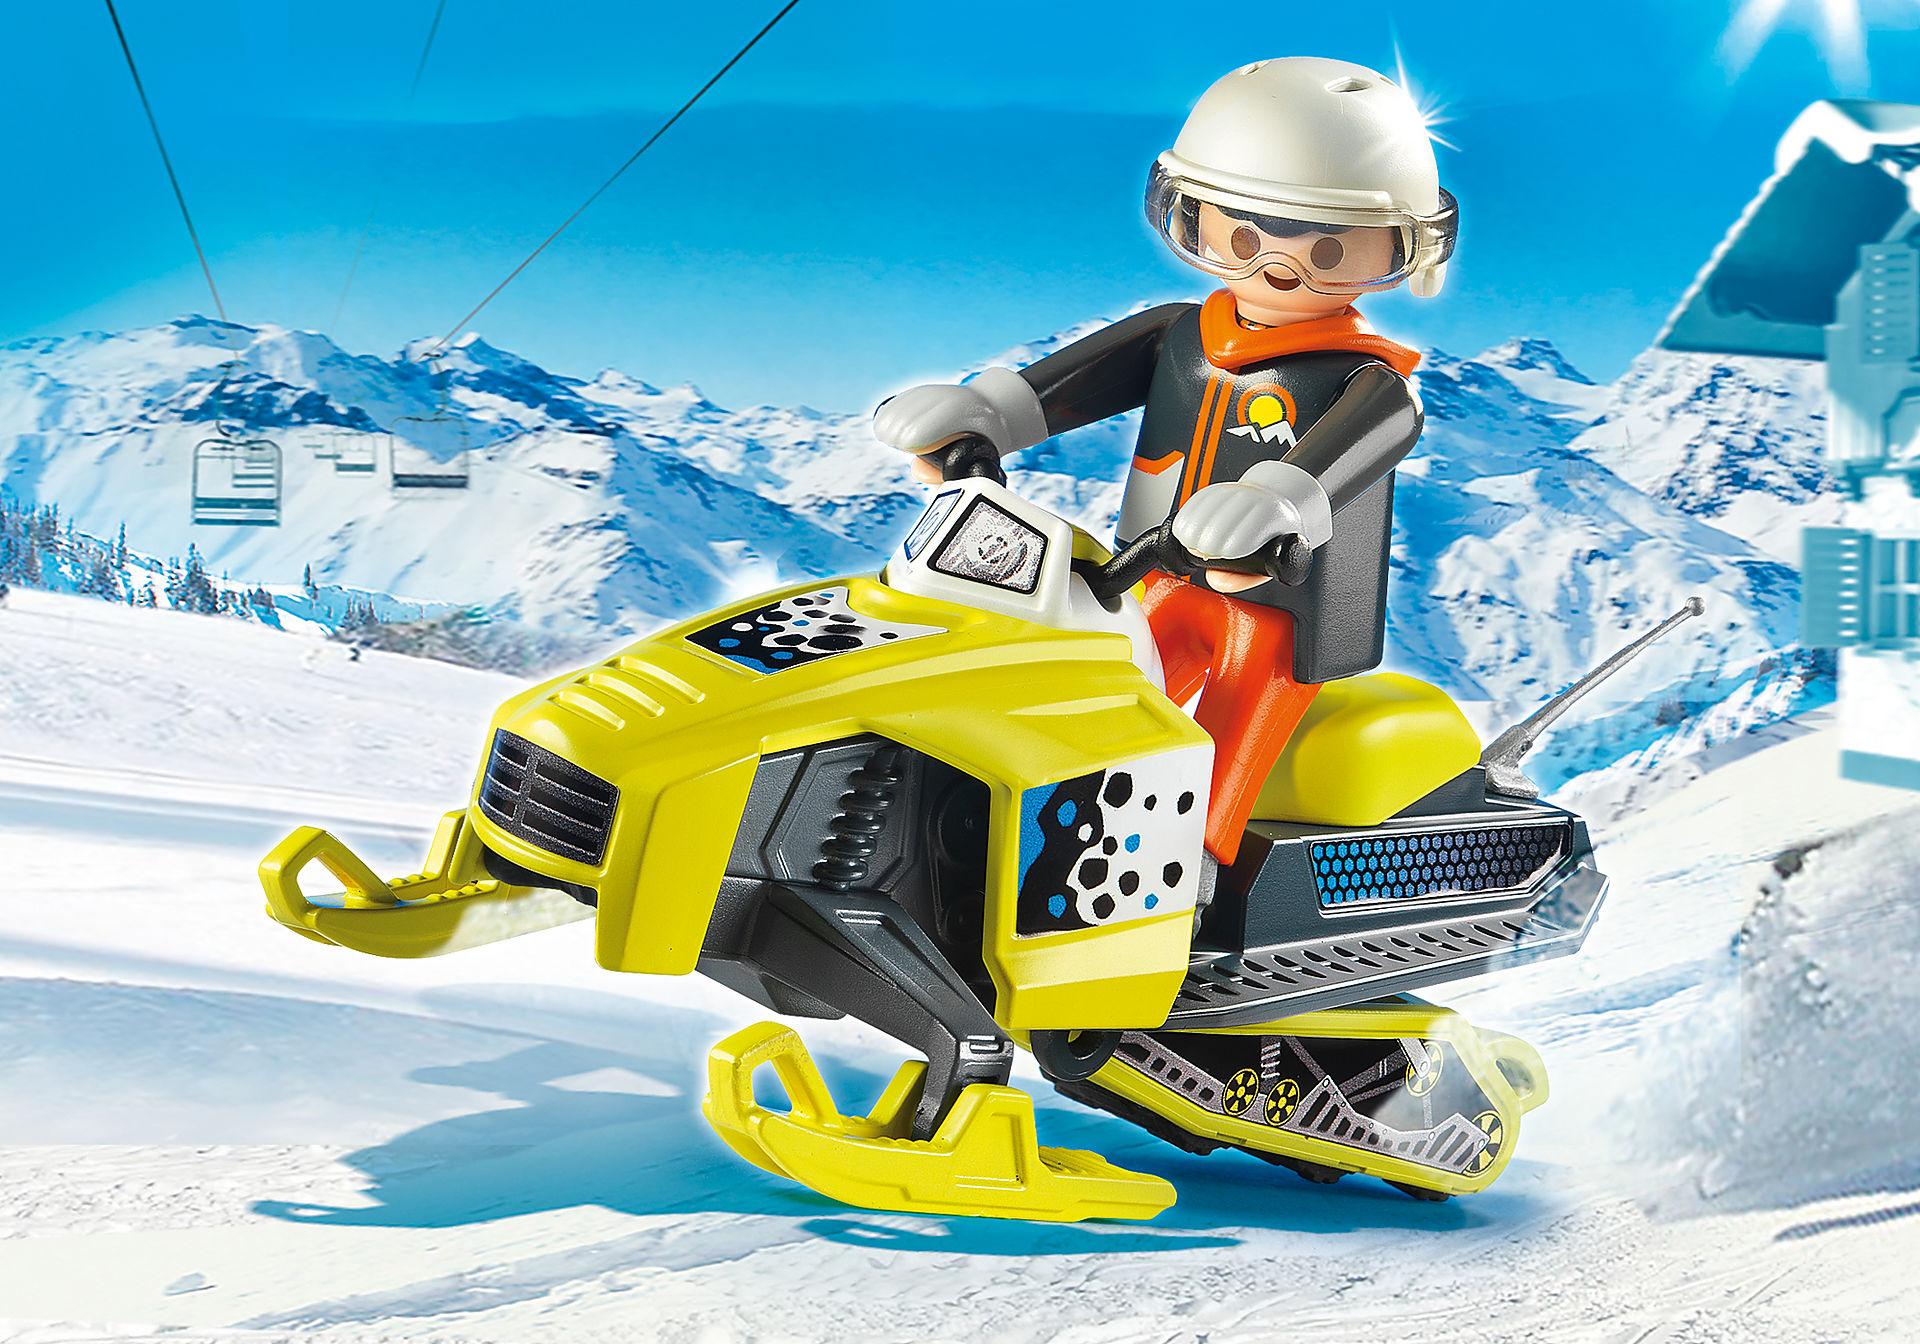 9285 Sneeuwscooter zoom image1